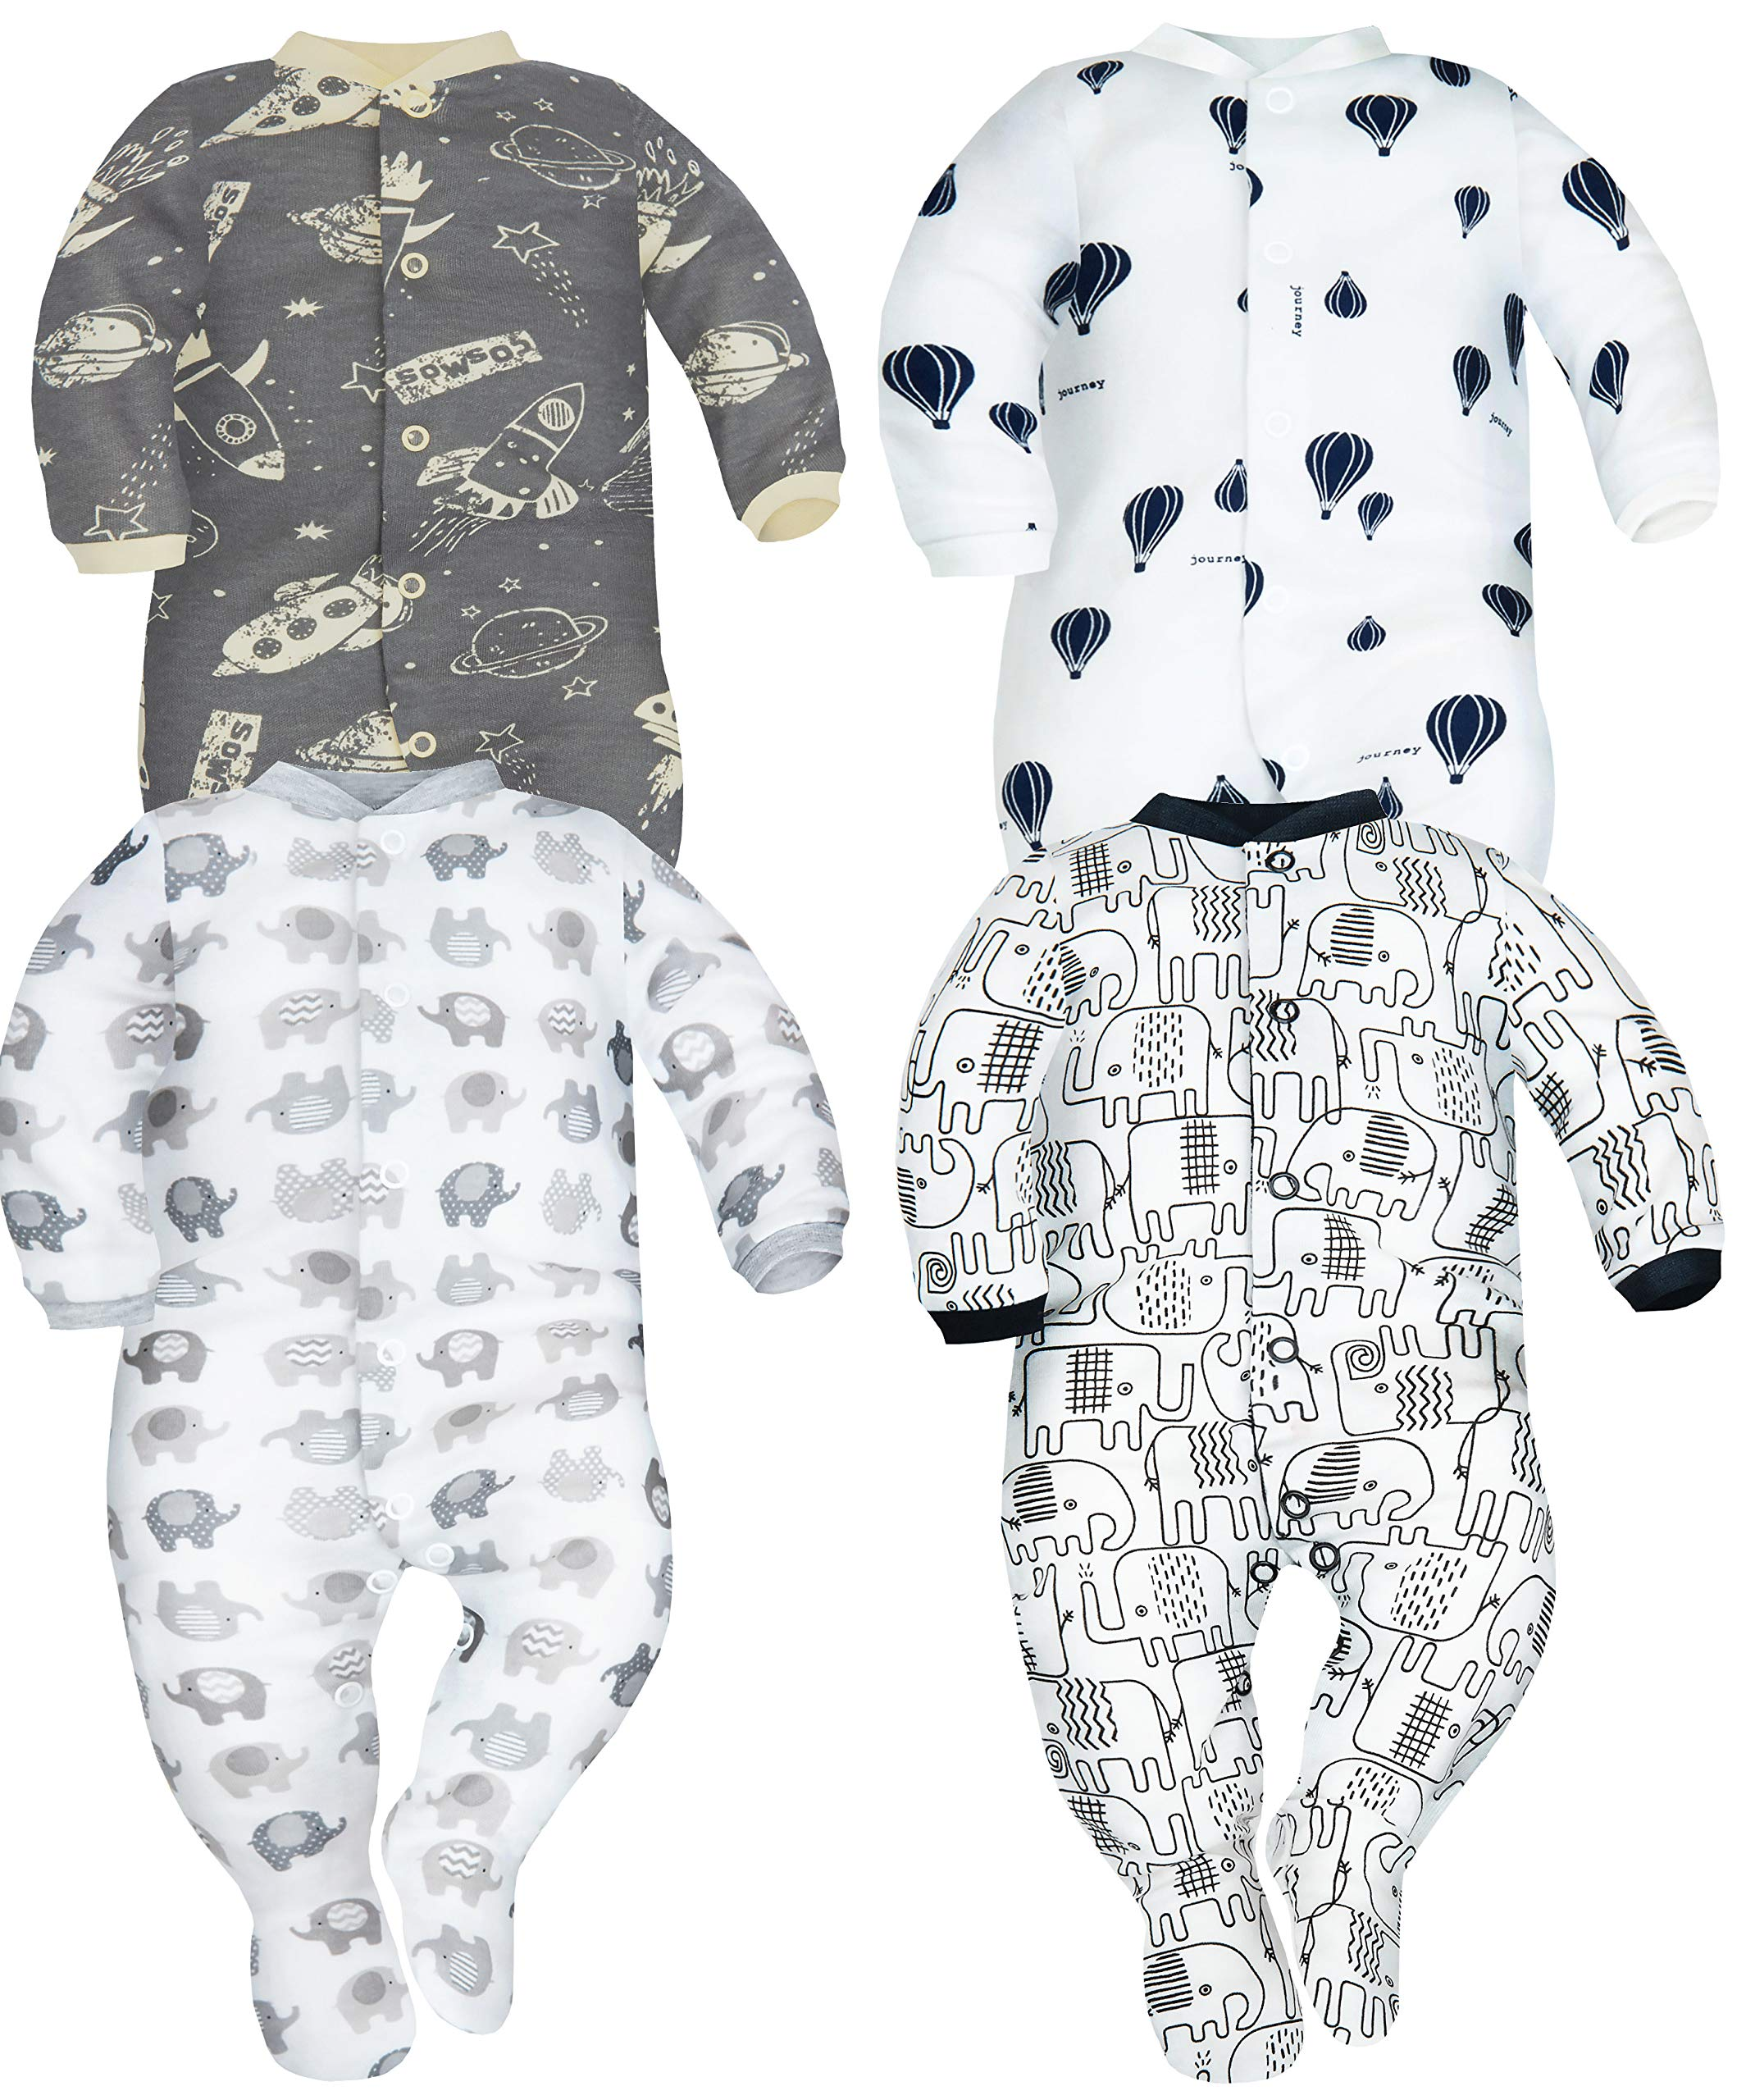 Sibinulo Niño Niña Pijama Bebé Pelele de ABS -Tamaños 80-92 - Pack de 4 6